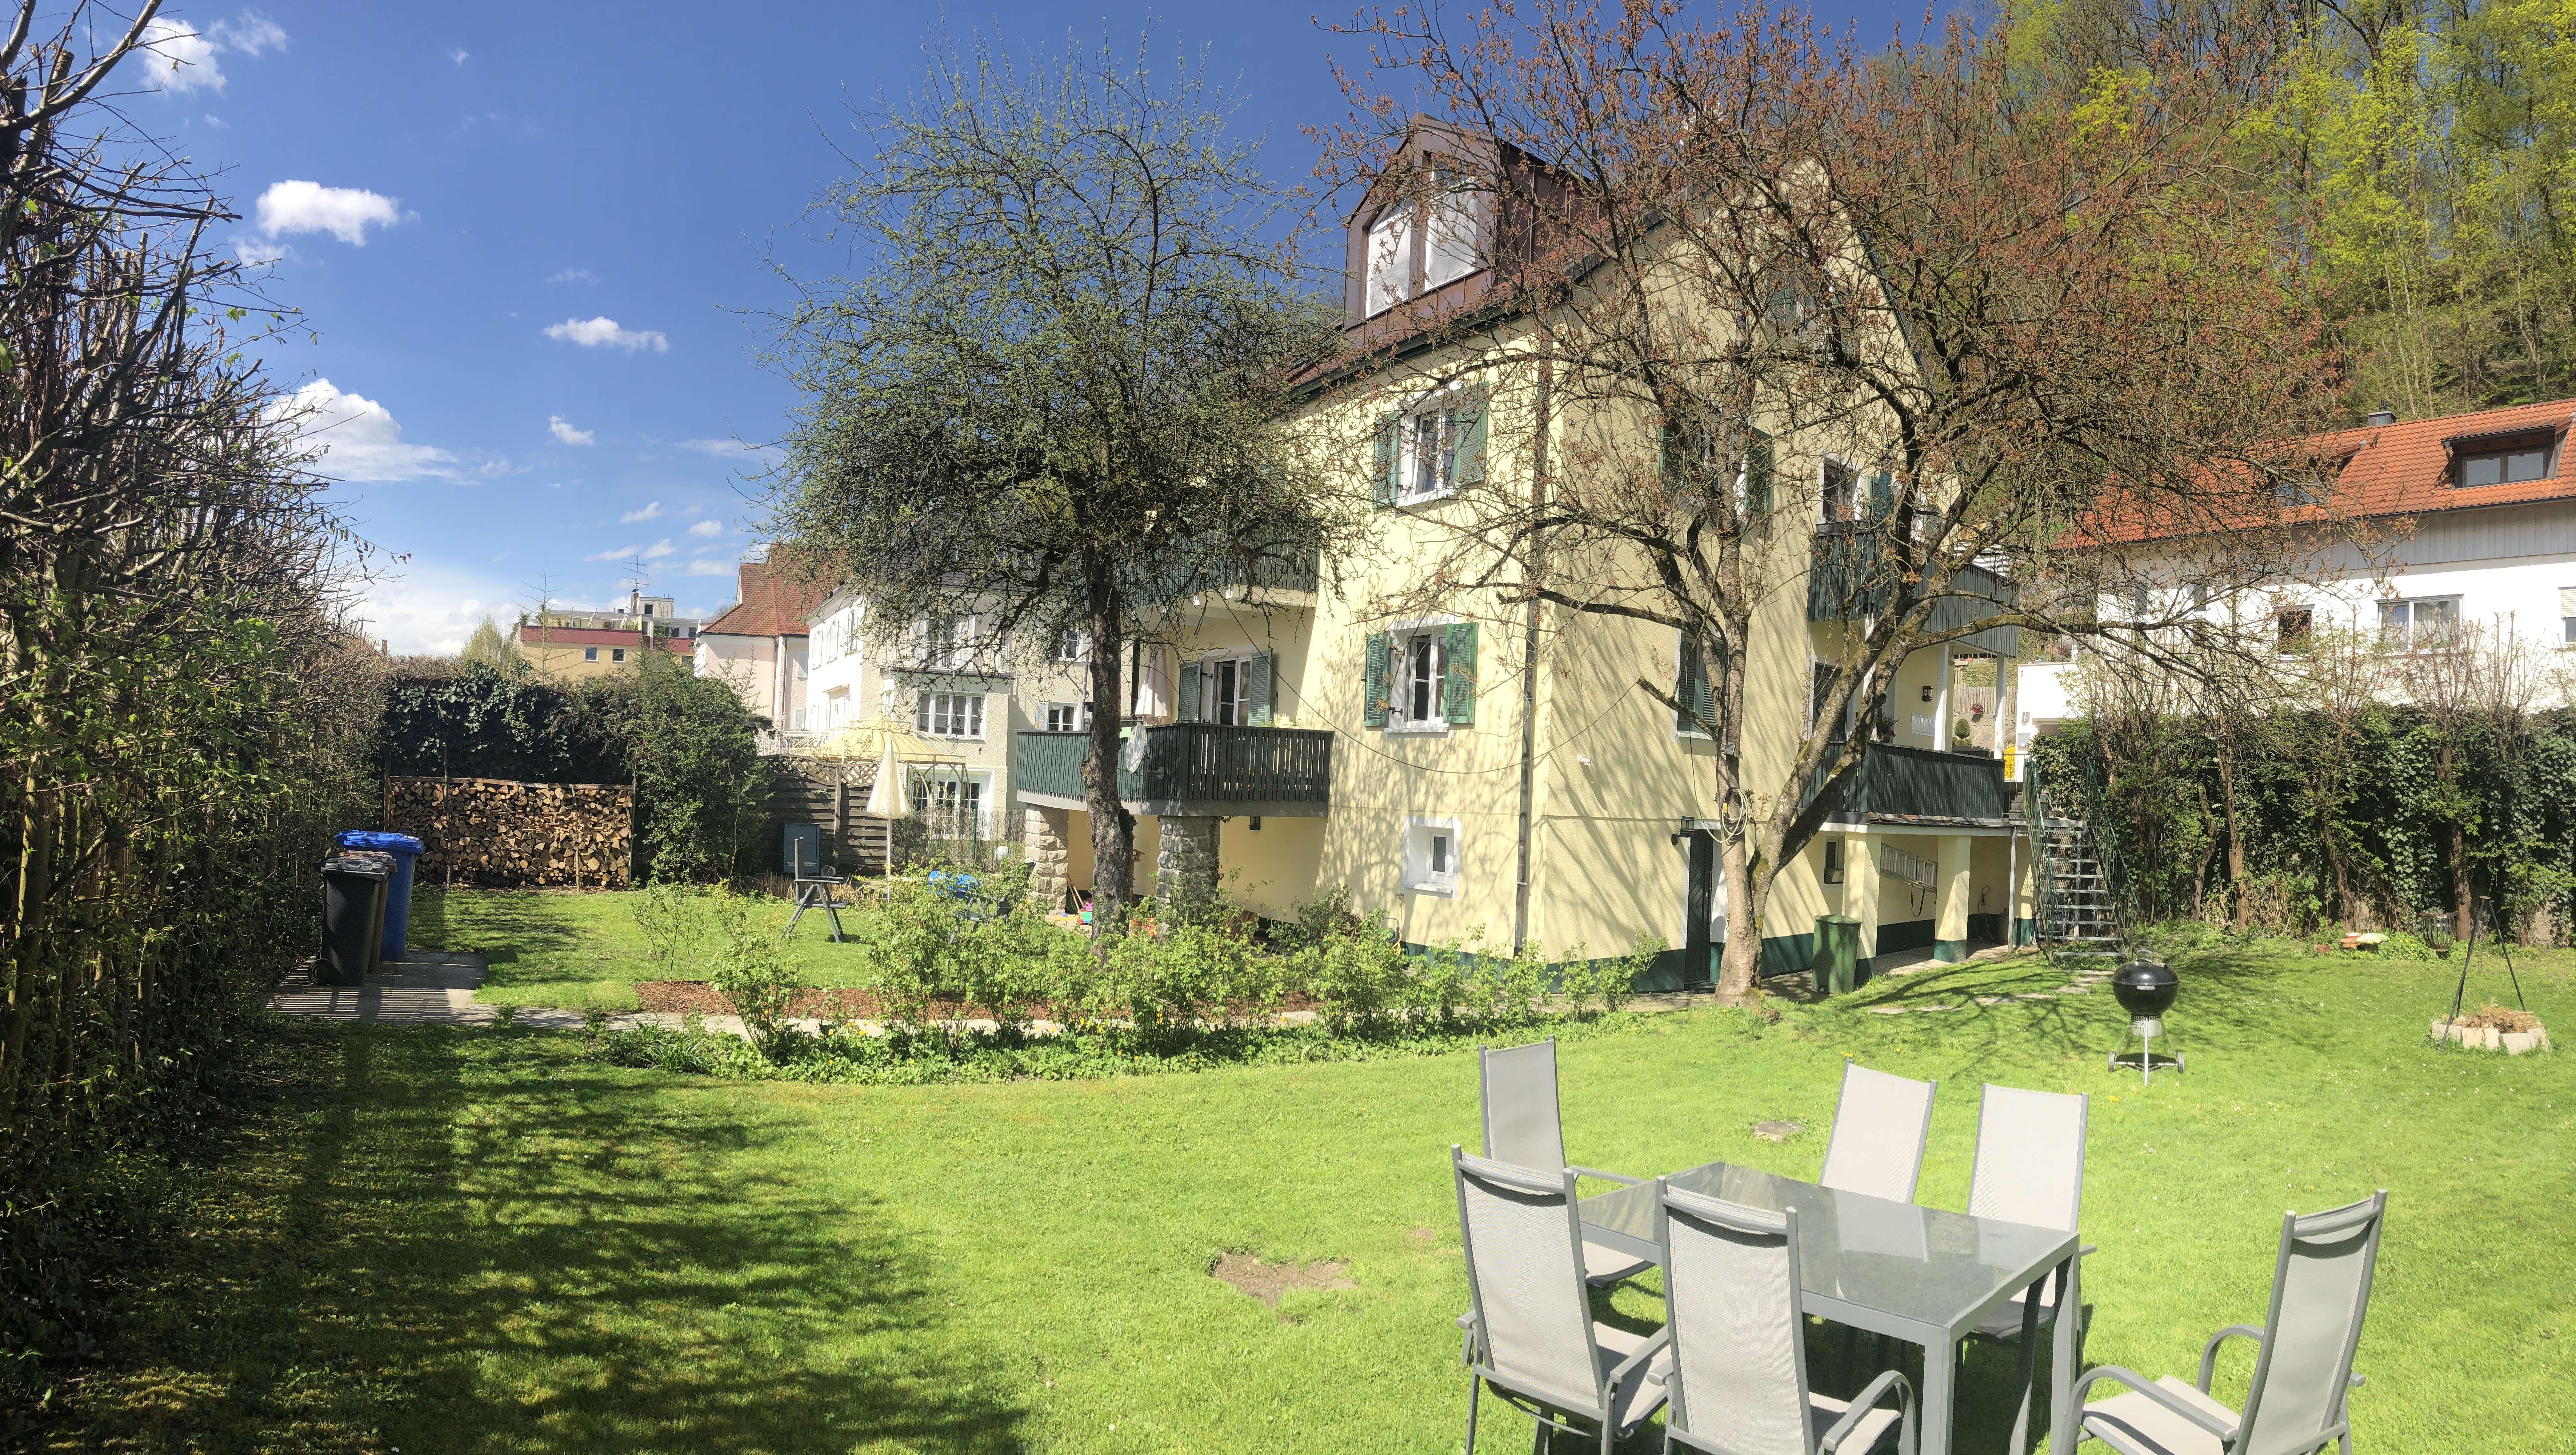 2-Zi DG mit grossem Garten in Hacklberg (Passau)